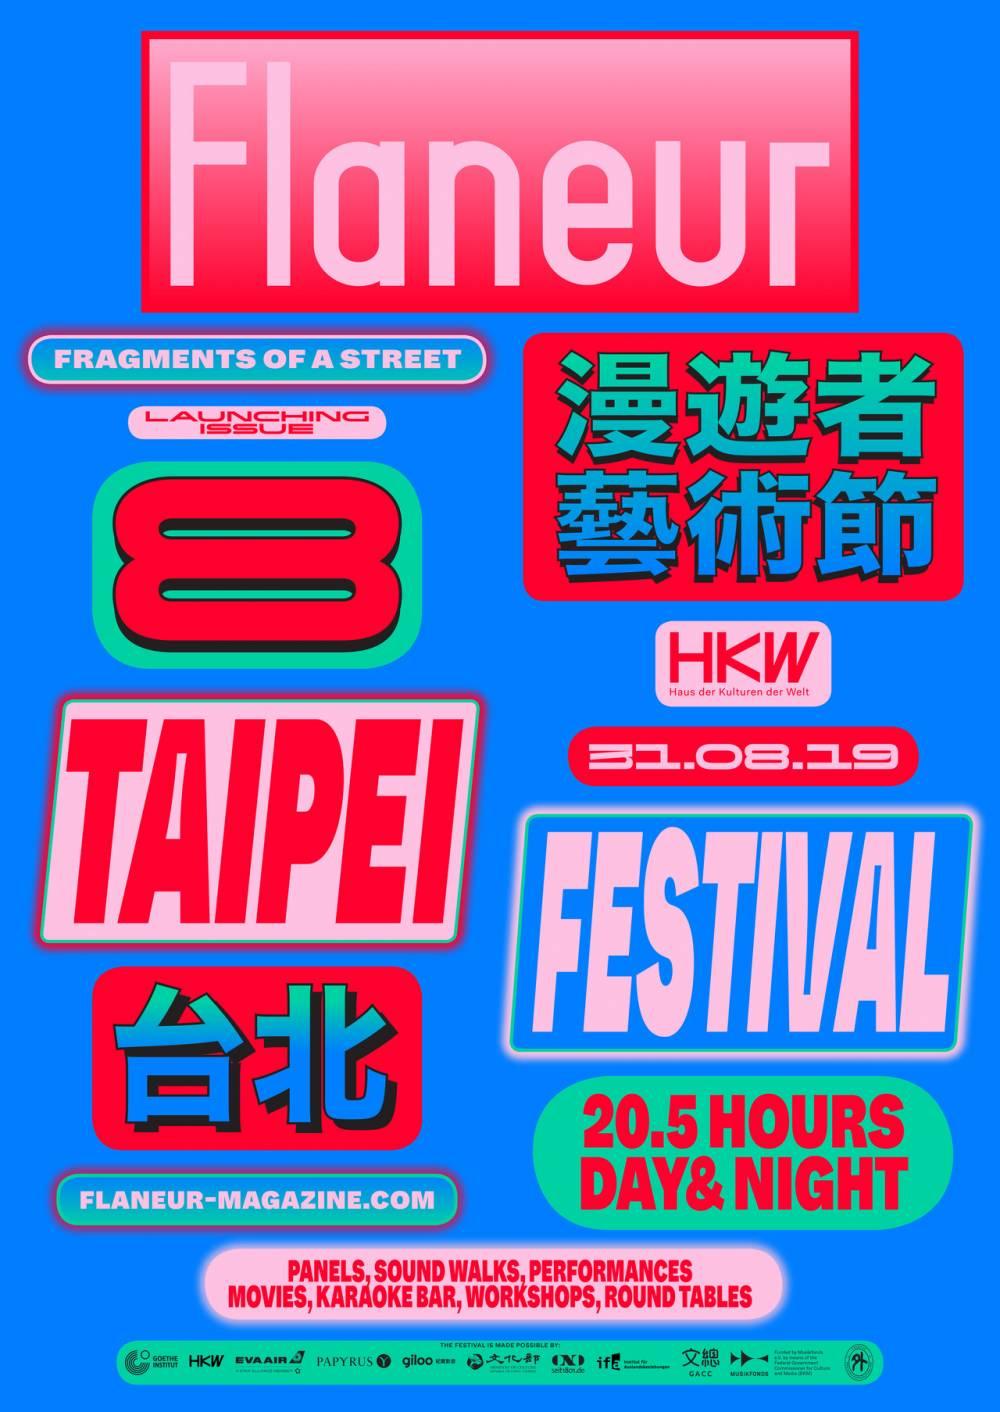 Flaneur Festival